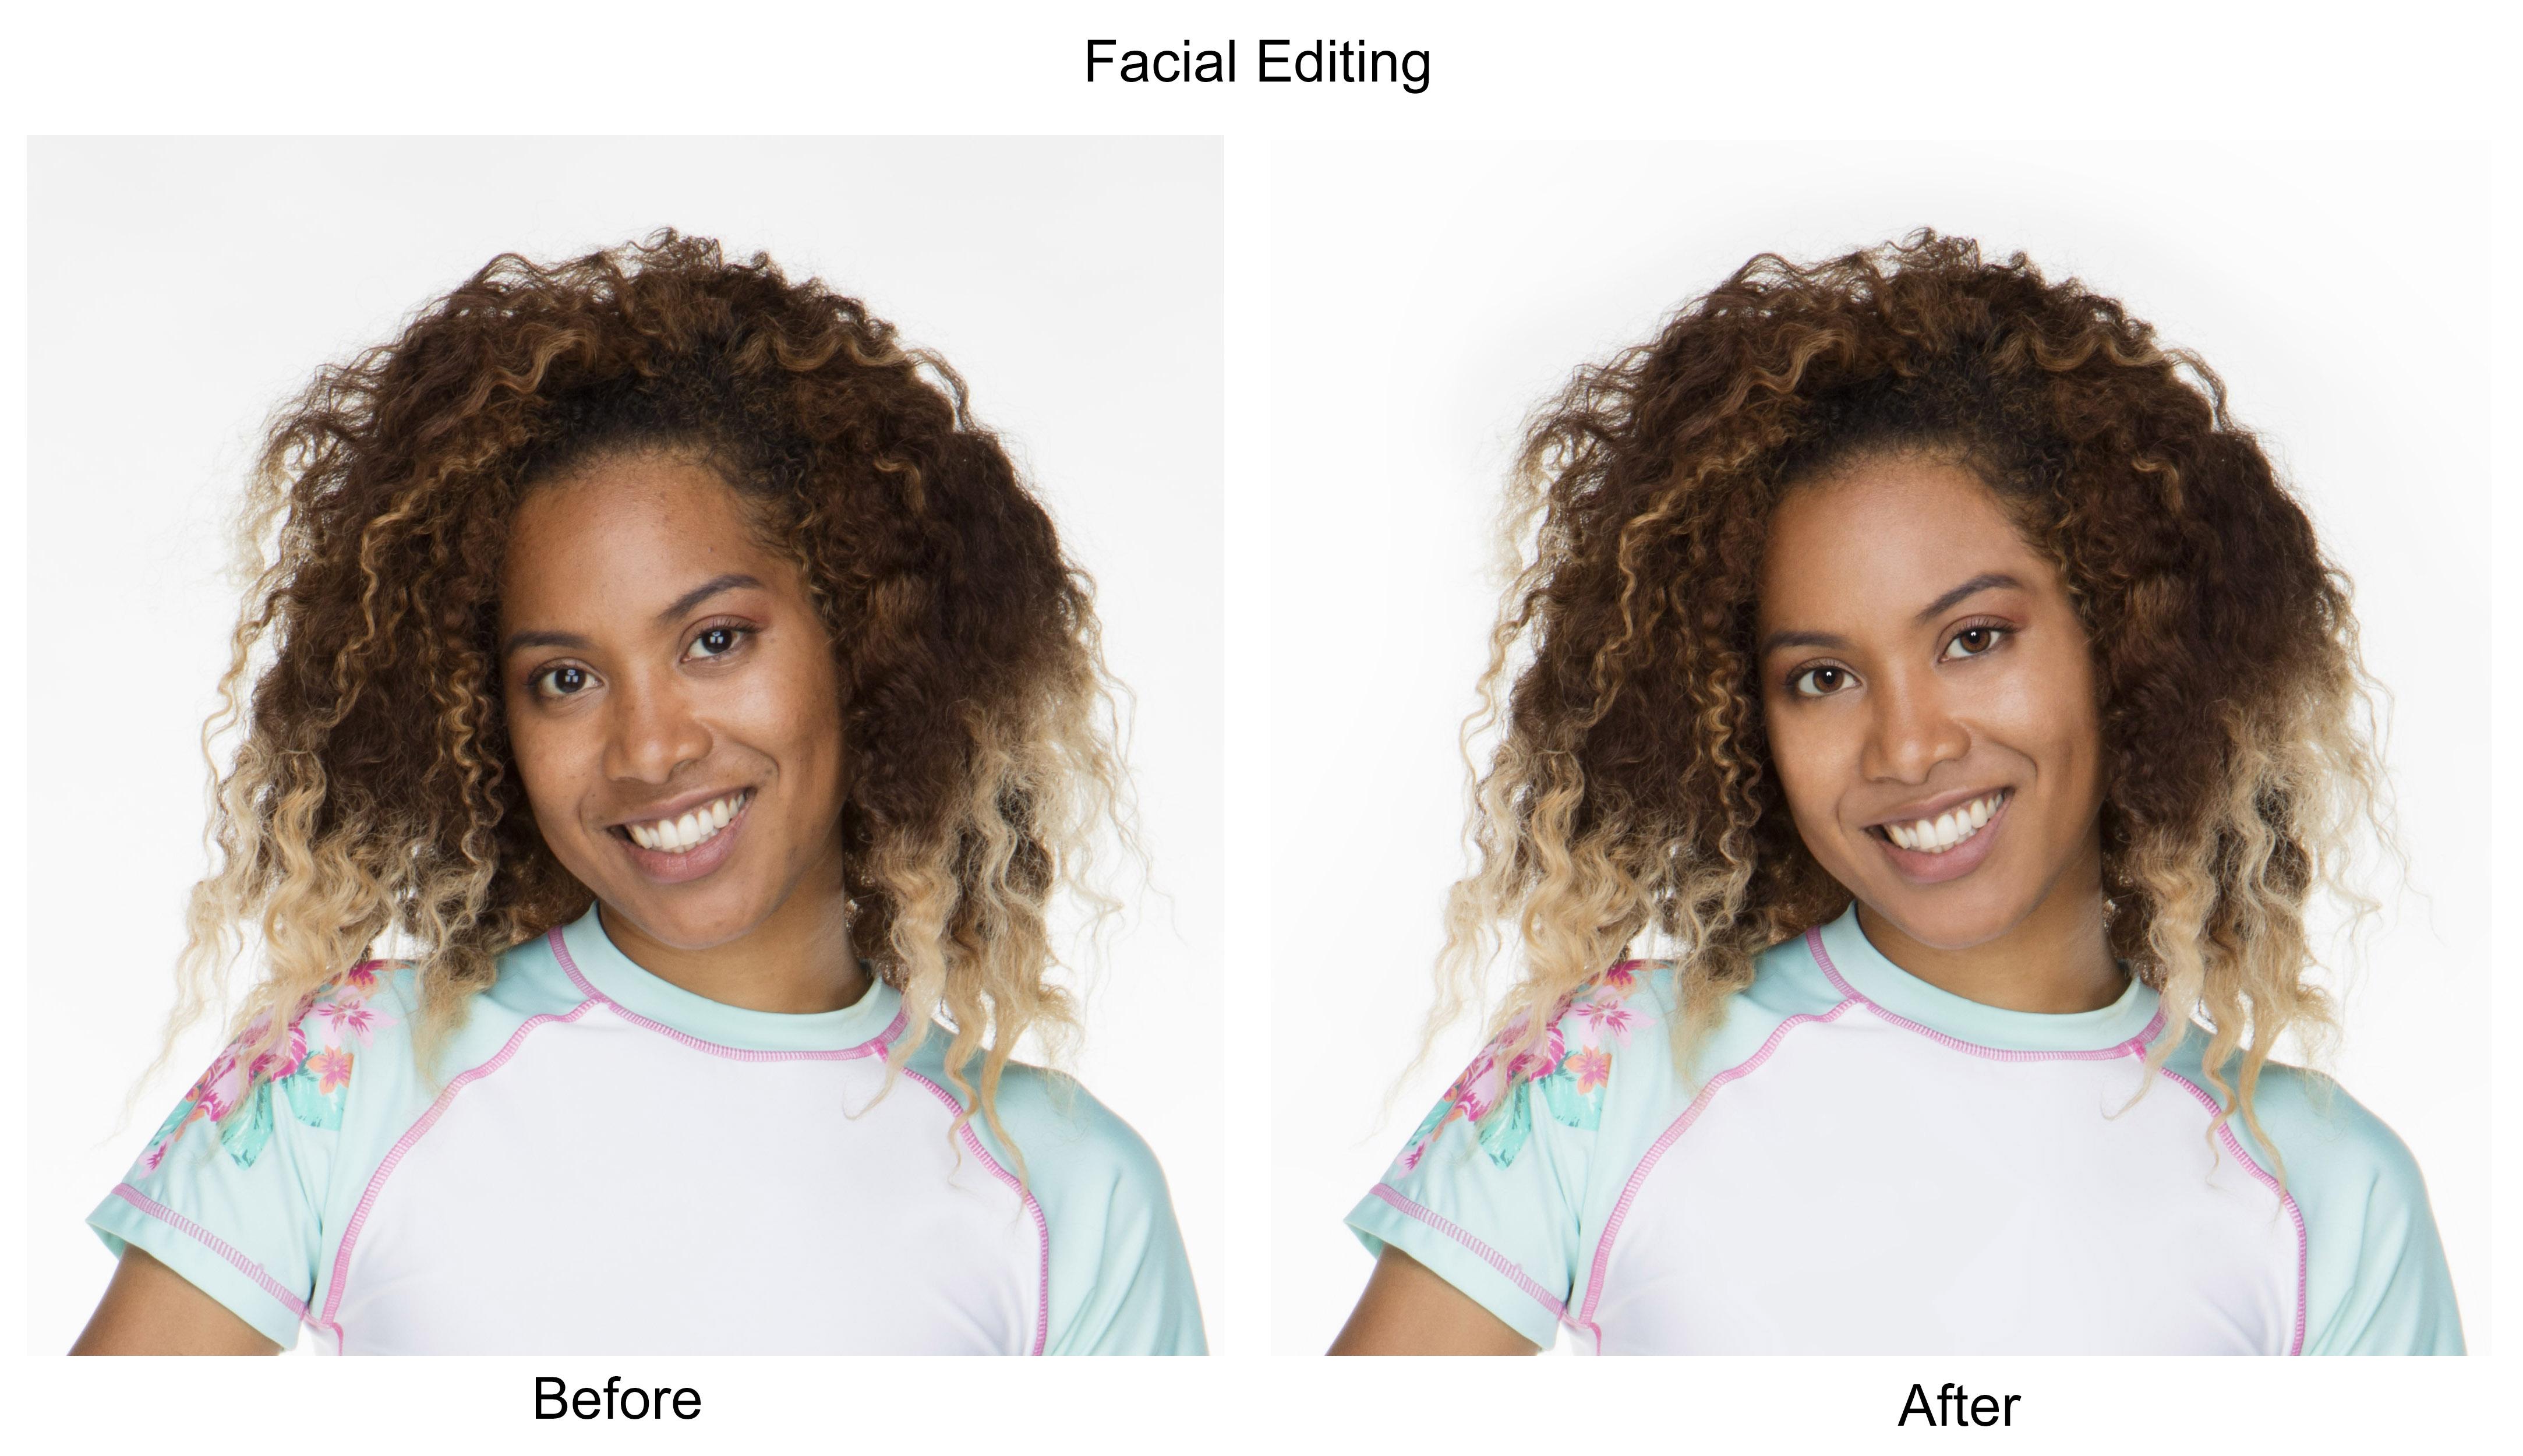 Facial edit